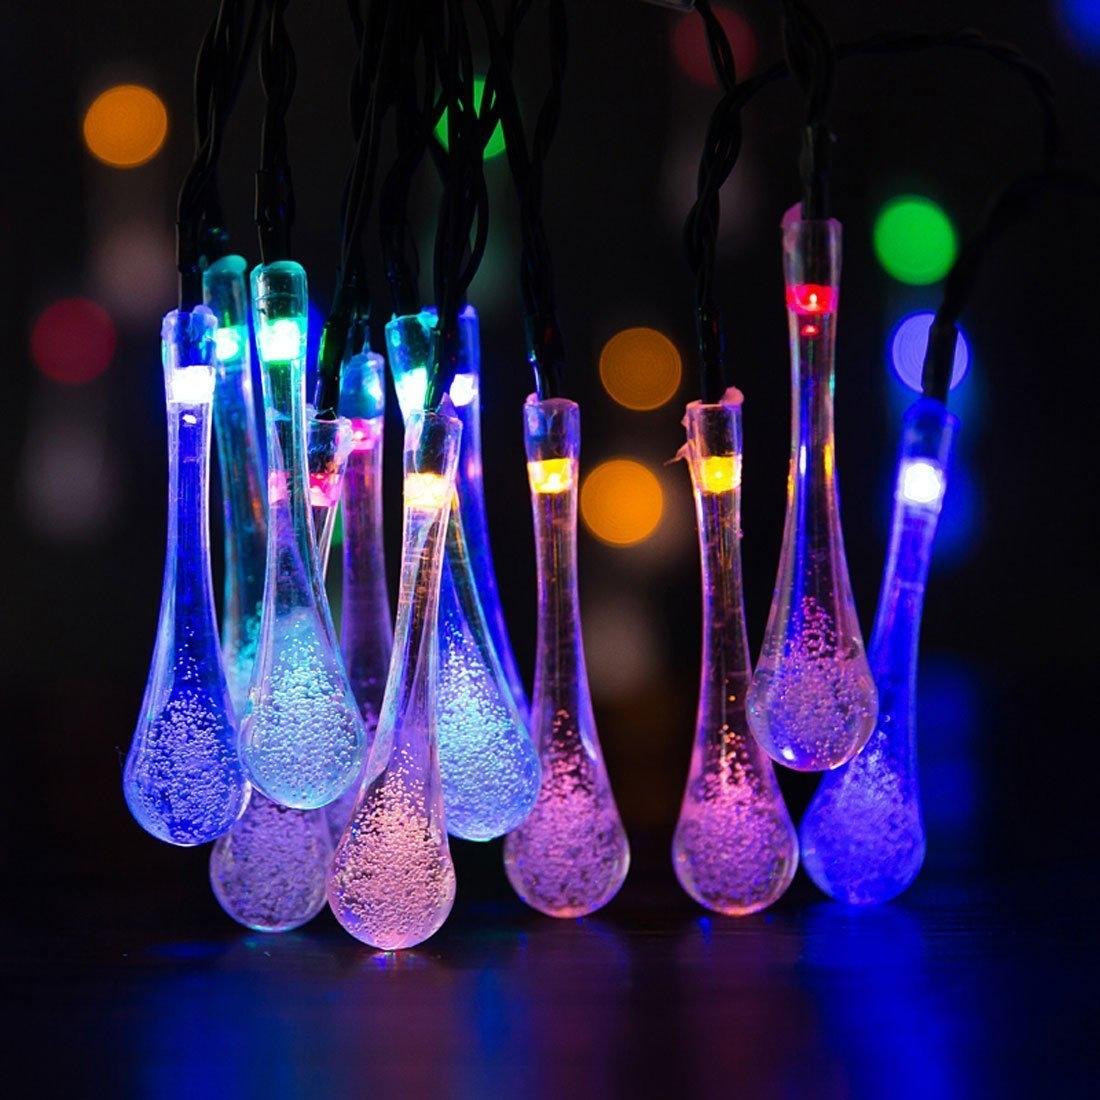 Solar outdoor string lights solar outdoor string lightsled rakunew mozeypictures Gallery